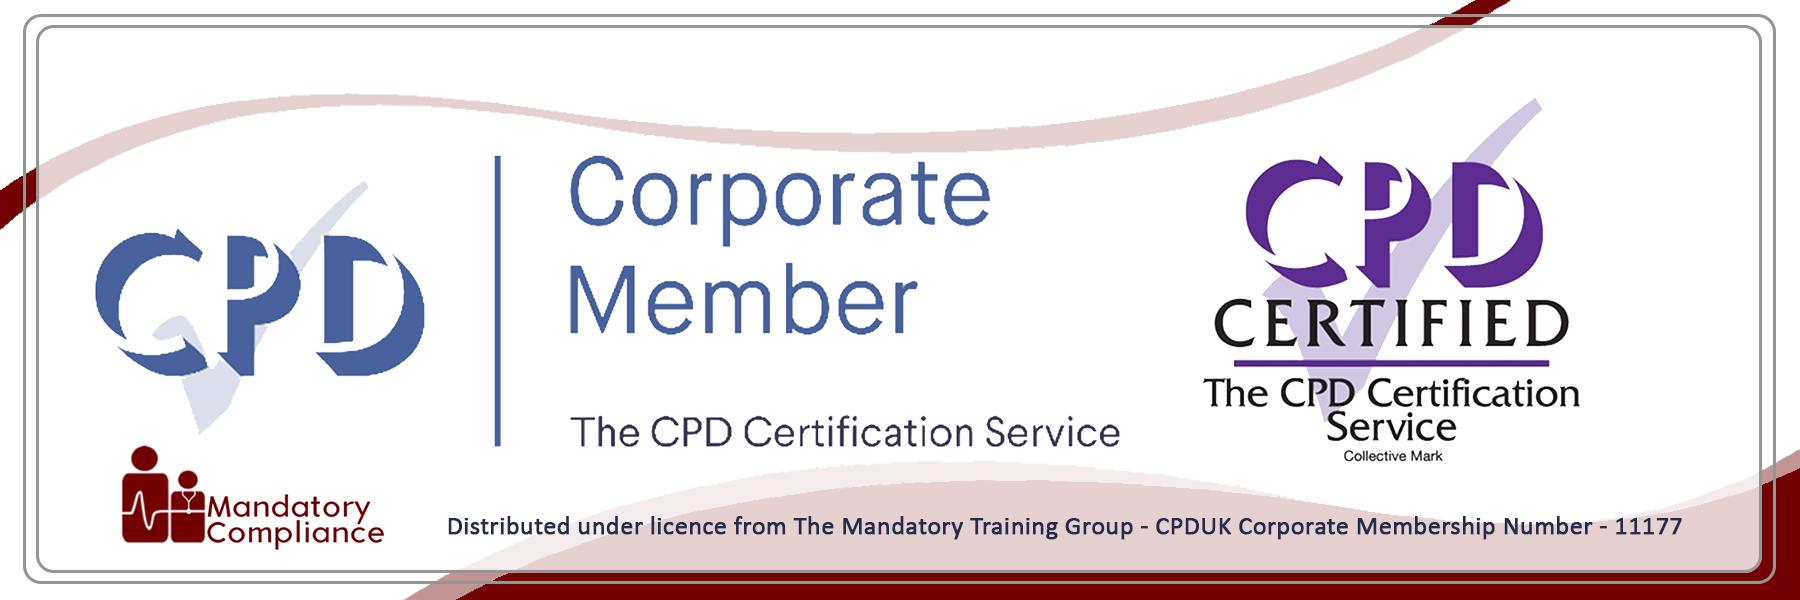 Presentation Skills Training - Online Training Course - CPD Accredited - Mandatory Compliance UK -